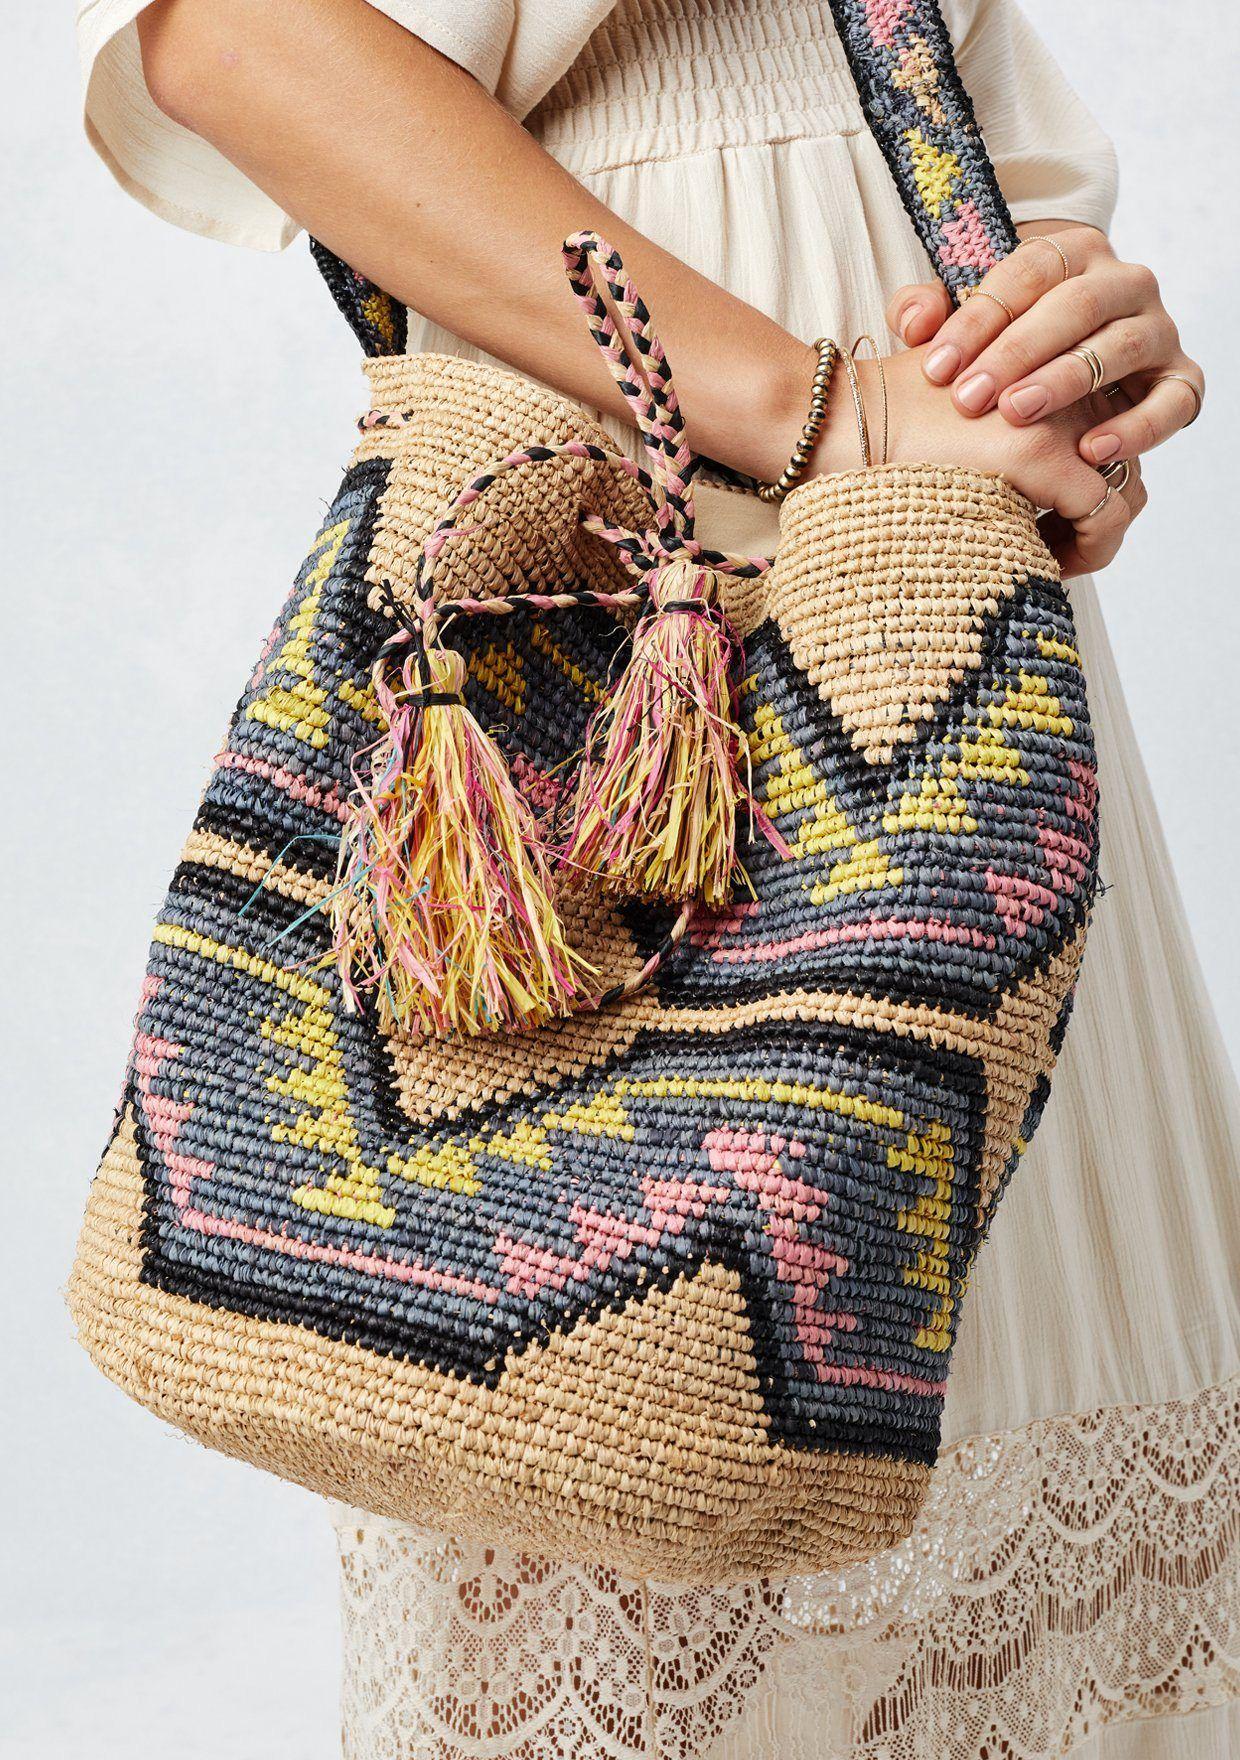 Crochet Tote Bag Shoulder Bag Festival Bag  Boho Bag Women Fashion Accessories Gift Ideas